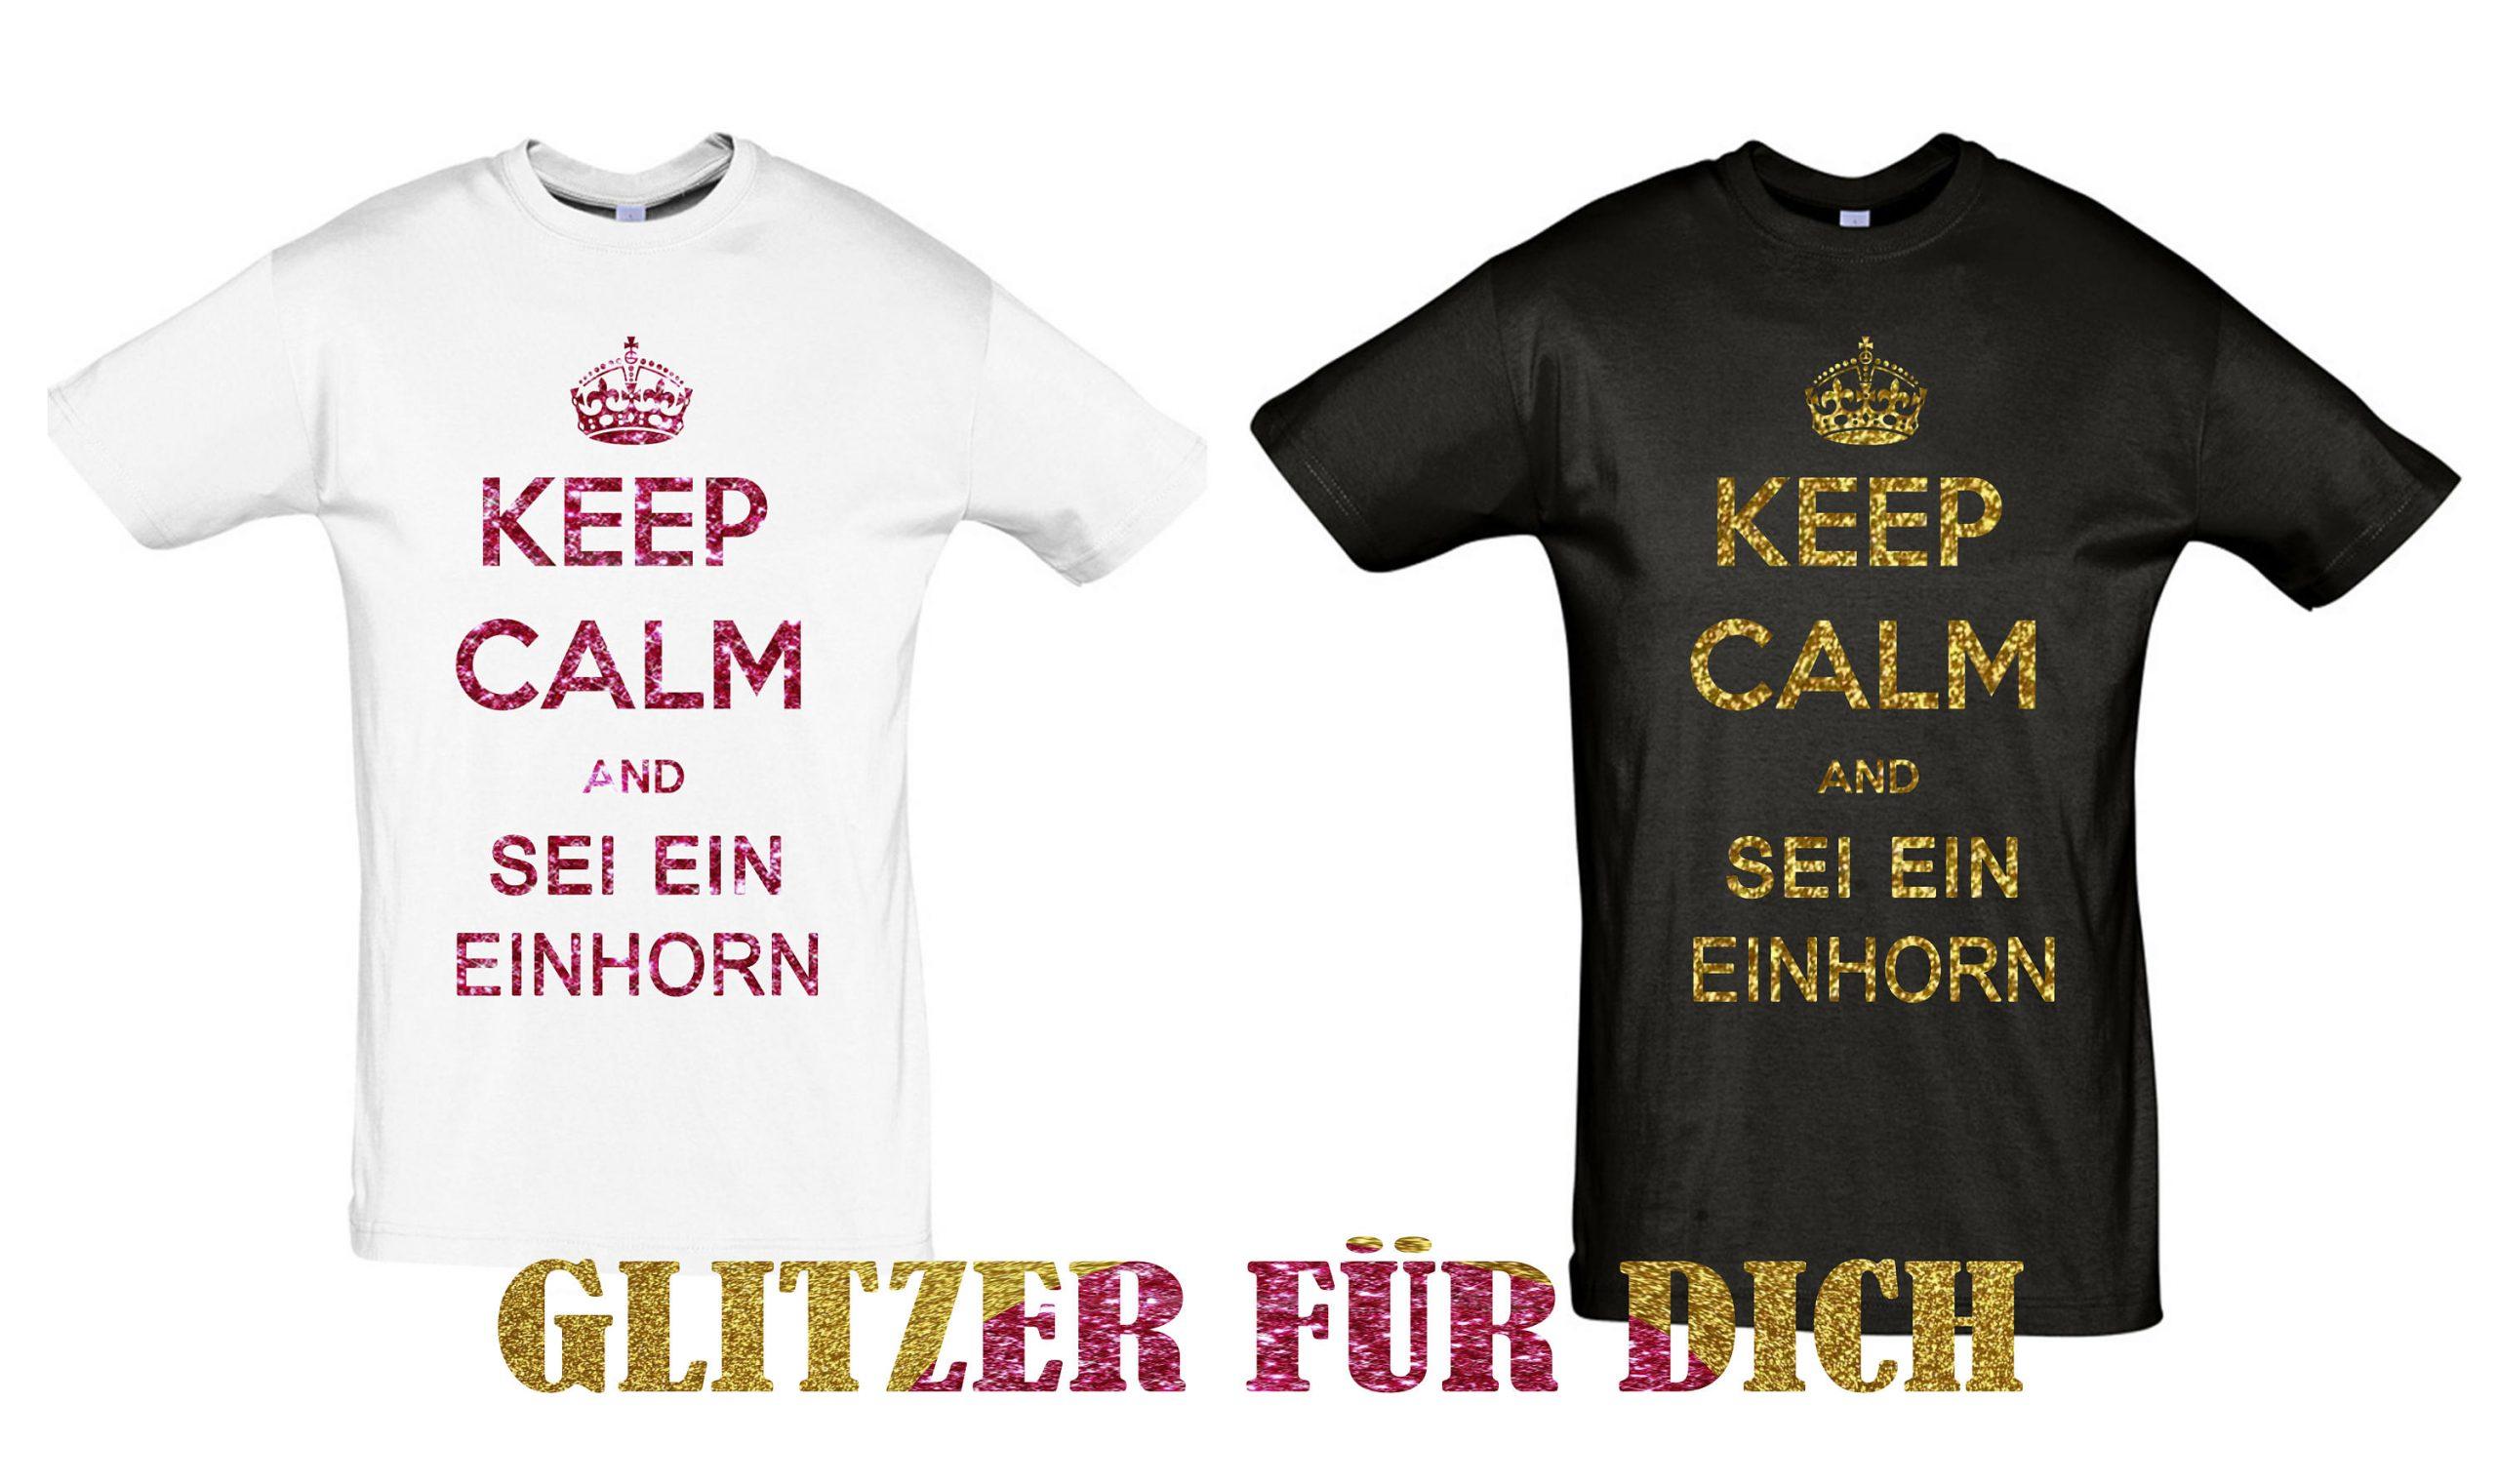 Full Size of Bayerische Sprüche T Shirt Damen Vatertag Sprüche T Shirt Ballermann Sprüche T Shirt Motorrad Sprüche T Shirt Küche Sprüche T Shirt